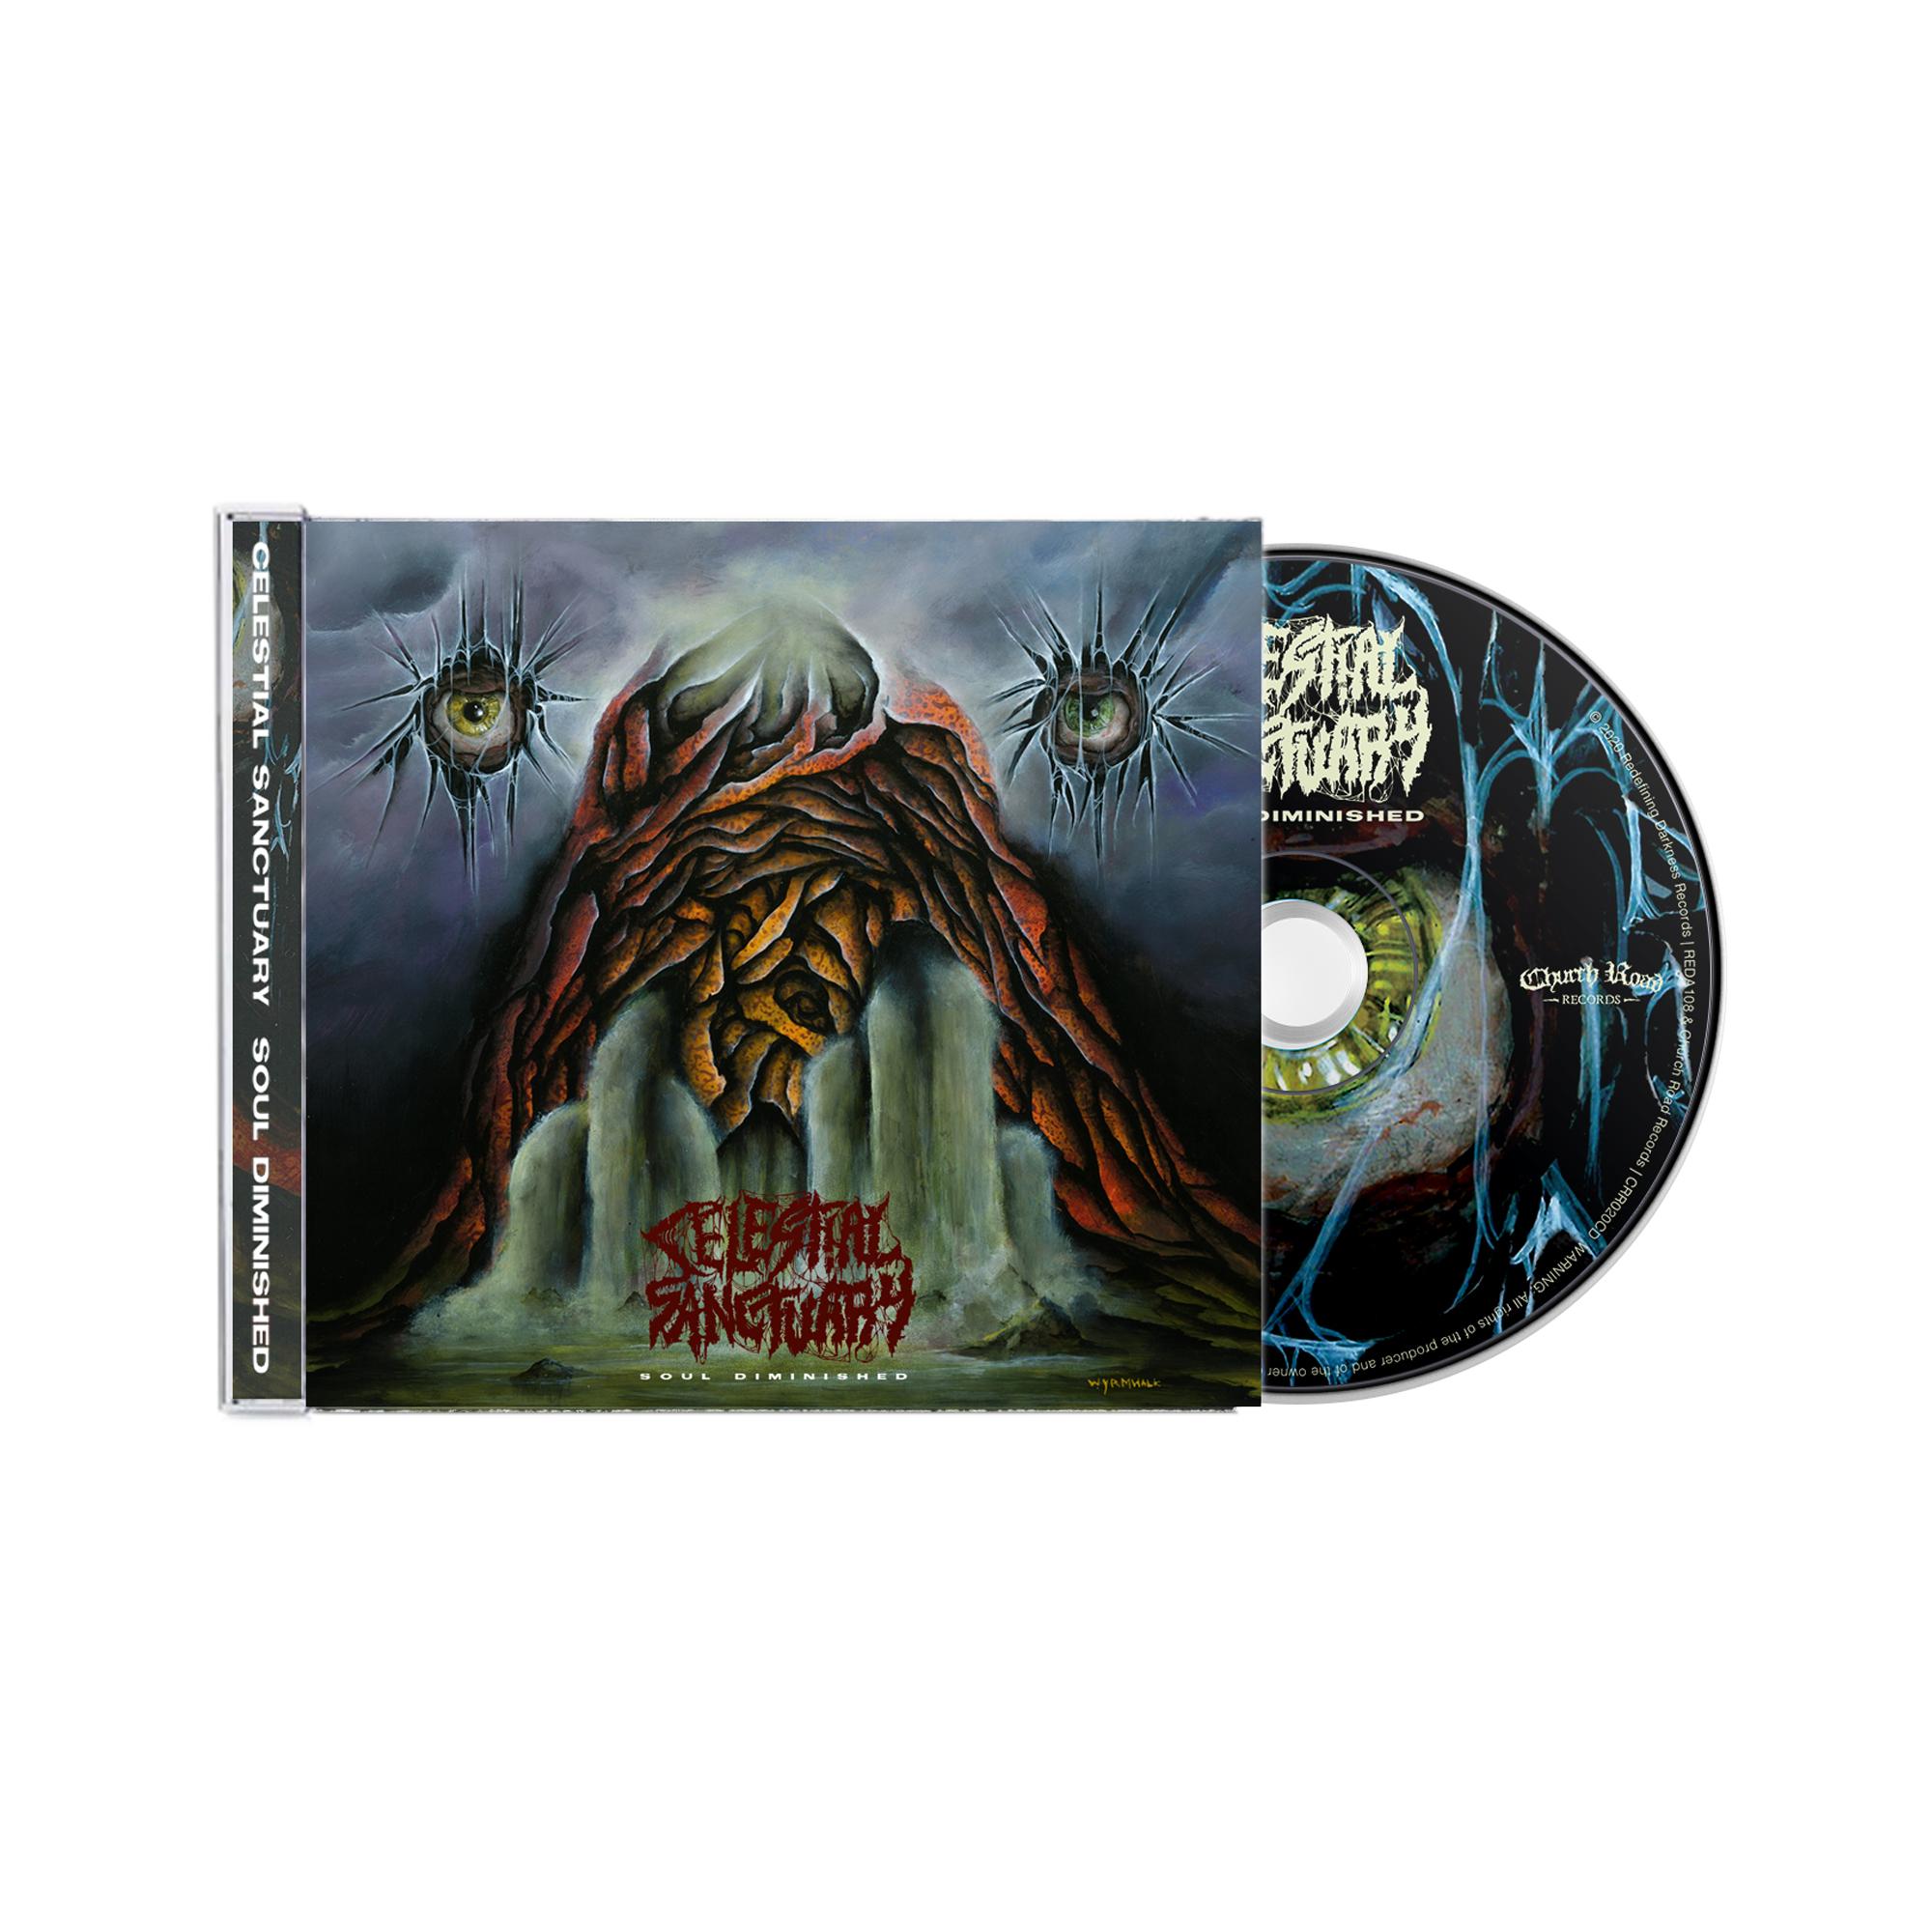 Celestial Sanctuary - Soul Diminished